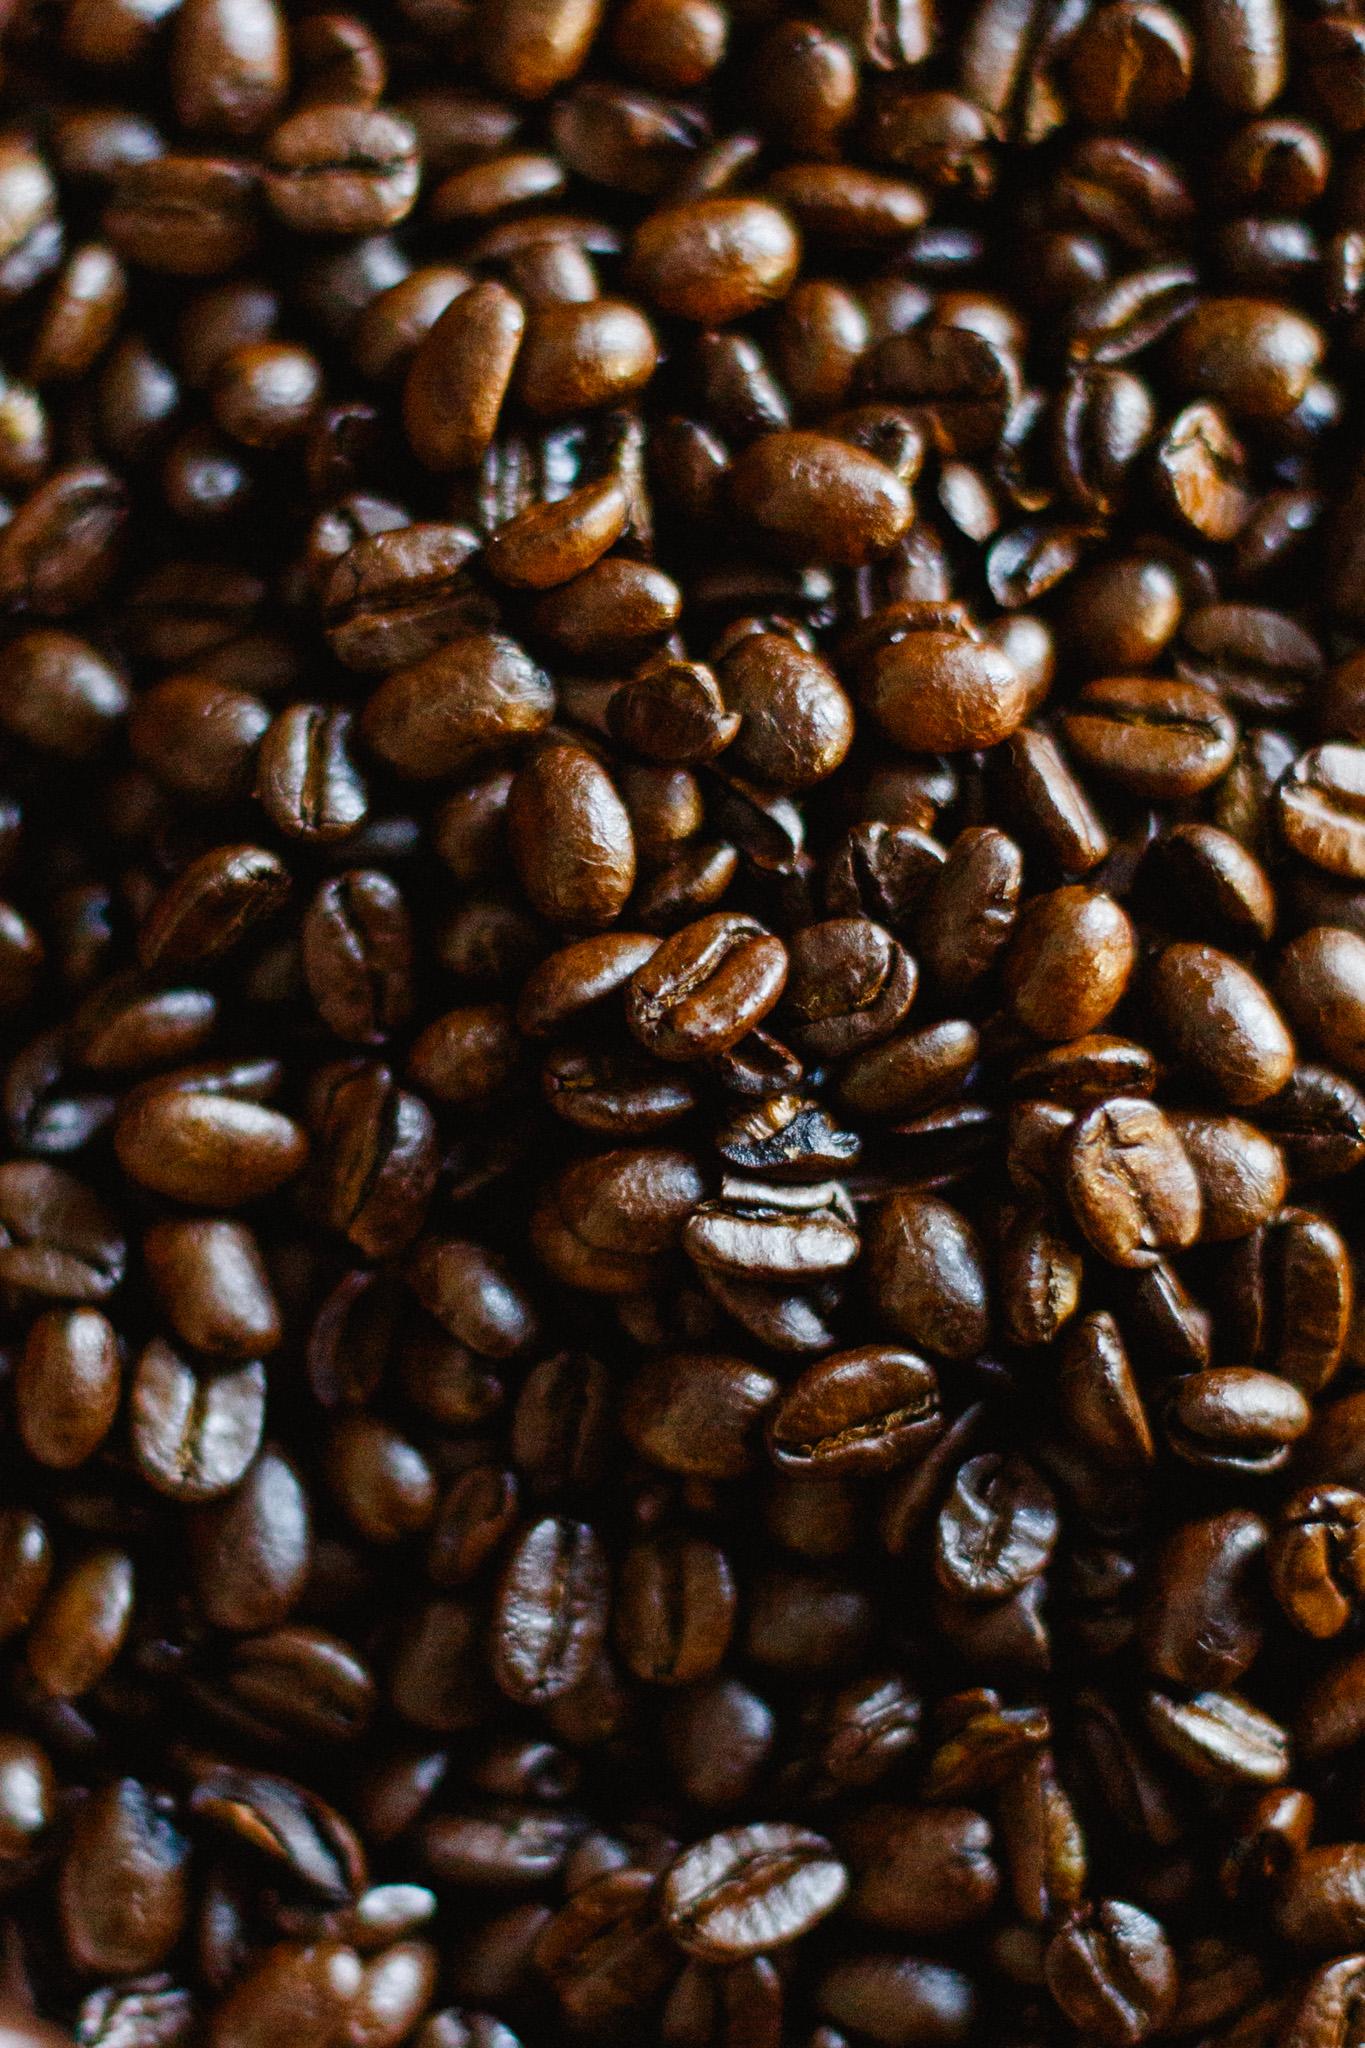 kaffe_josephine_foundation_web-1014.jpg